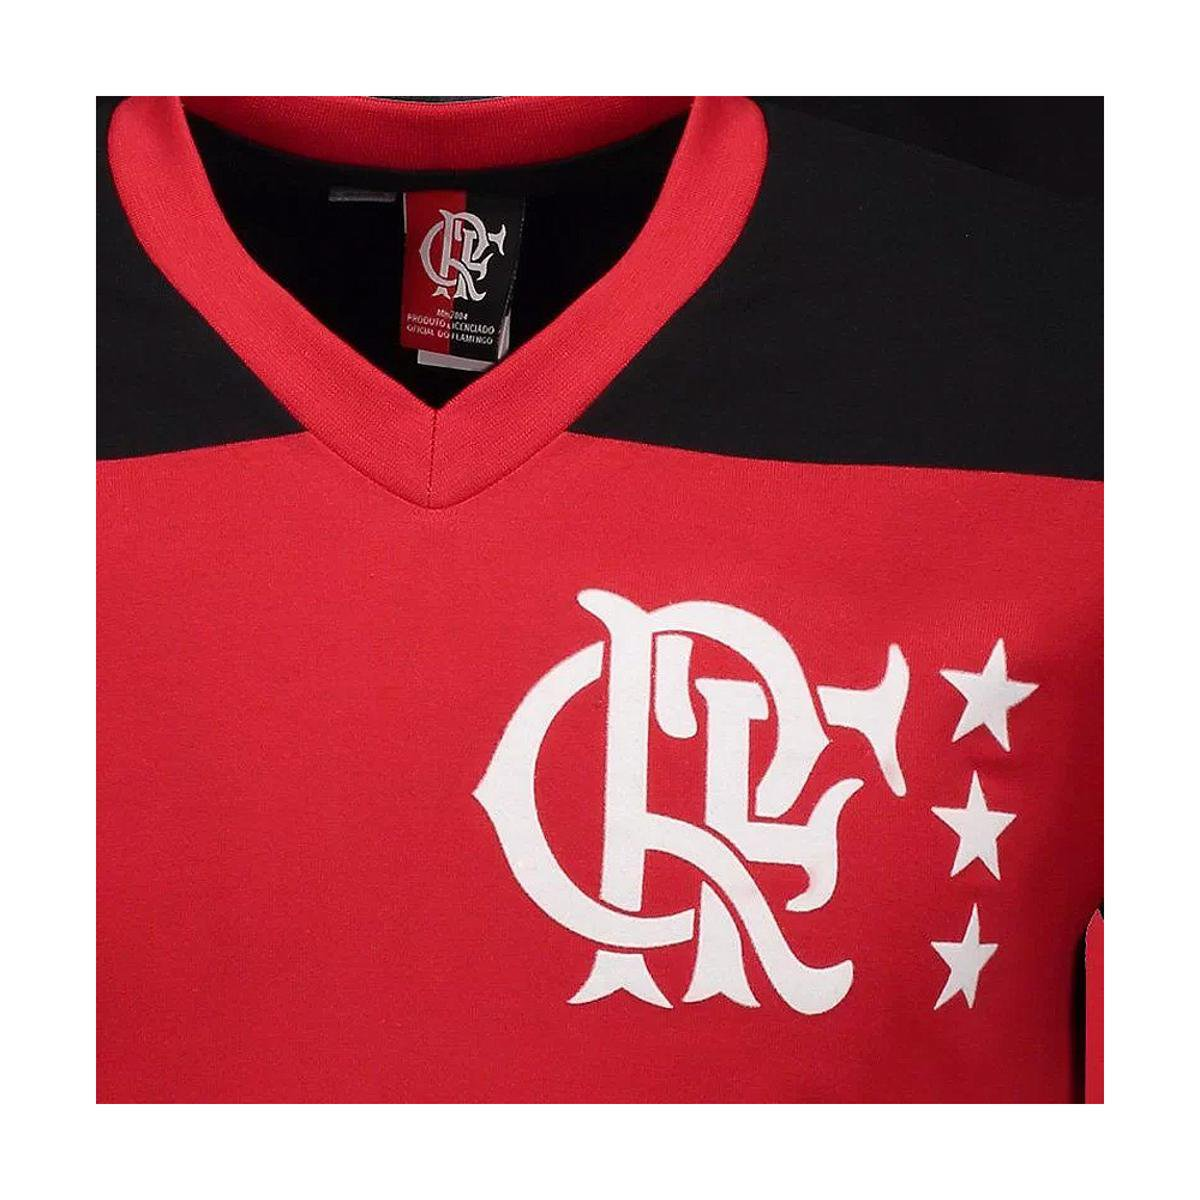 8bb8e8caea Camisa Flamengo Retrô Libertadores Masculina  Camisa Flamengo Retrô  Libertadores Masculina ...